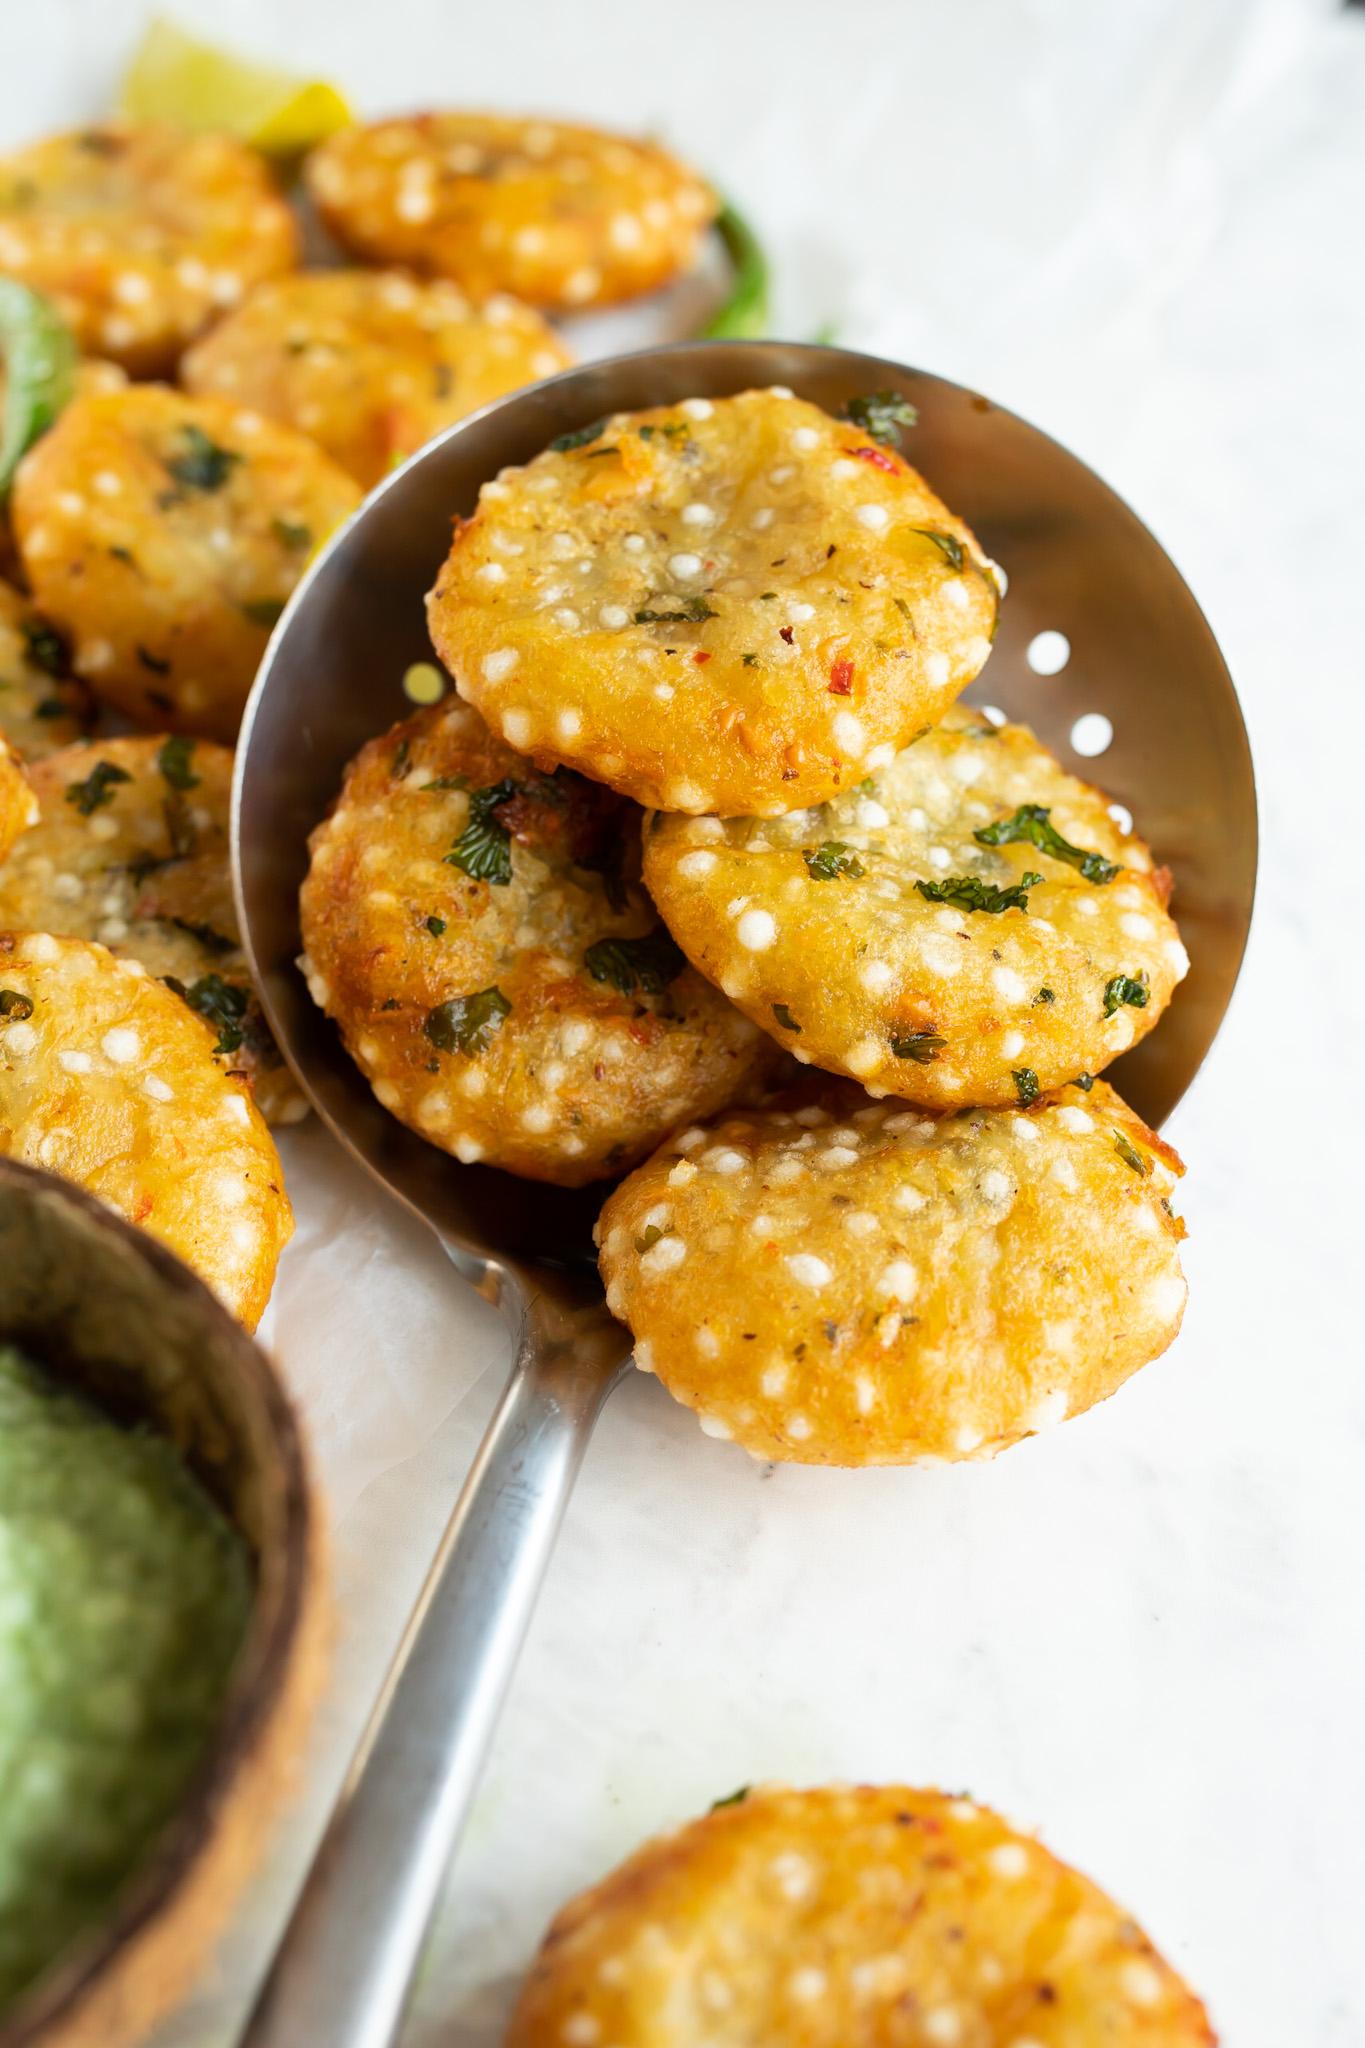 Sabudana Vada - Fritters for fasting recipe